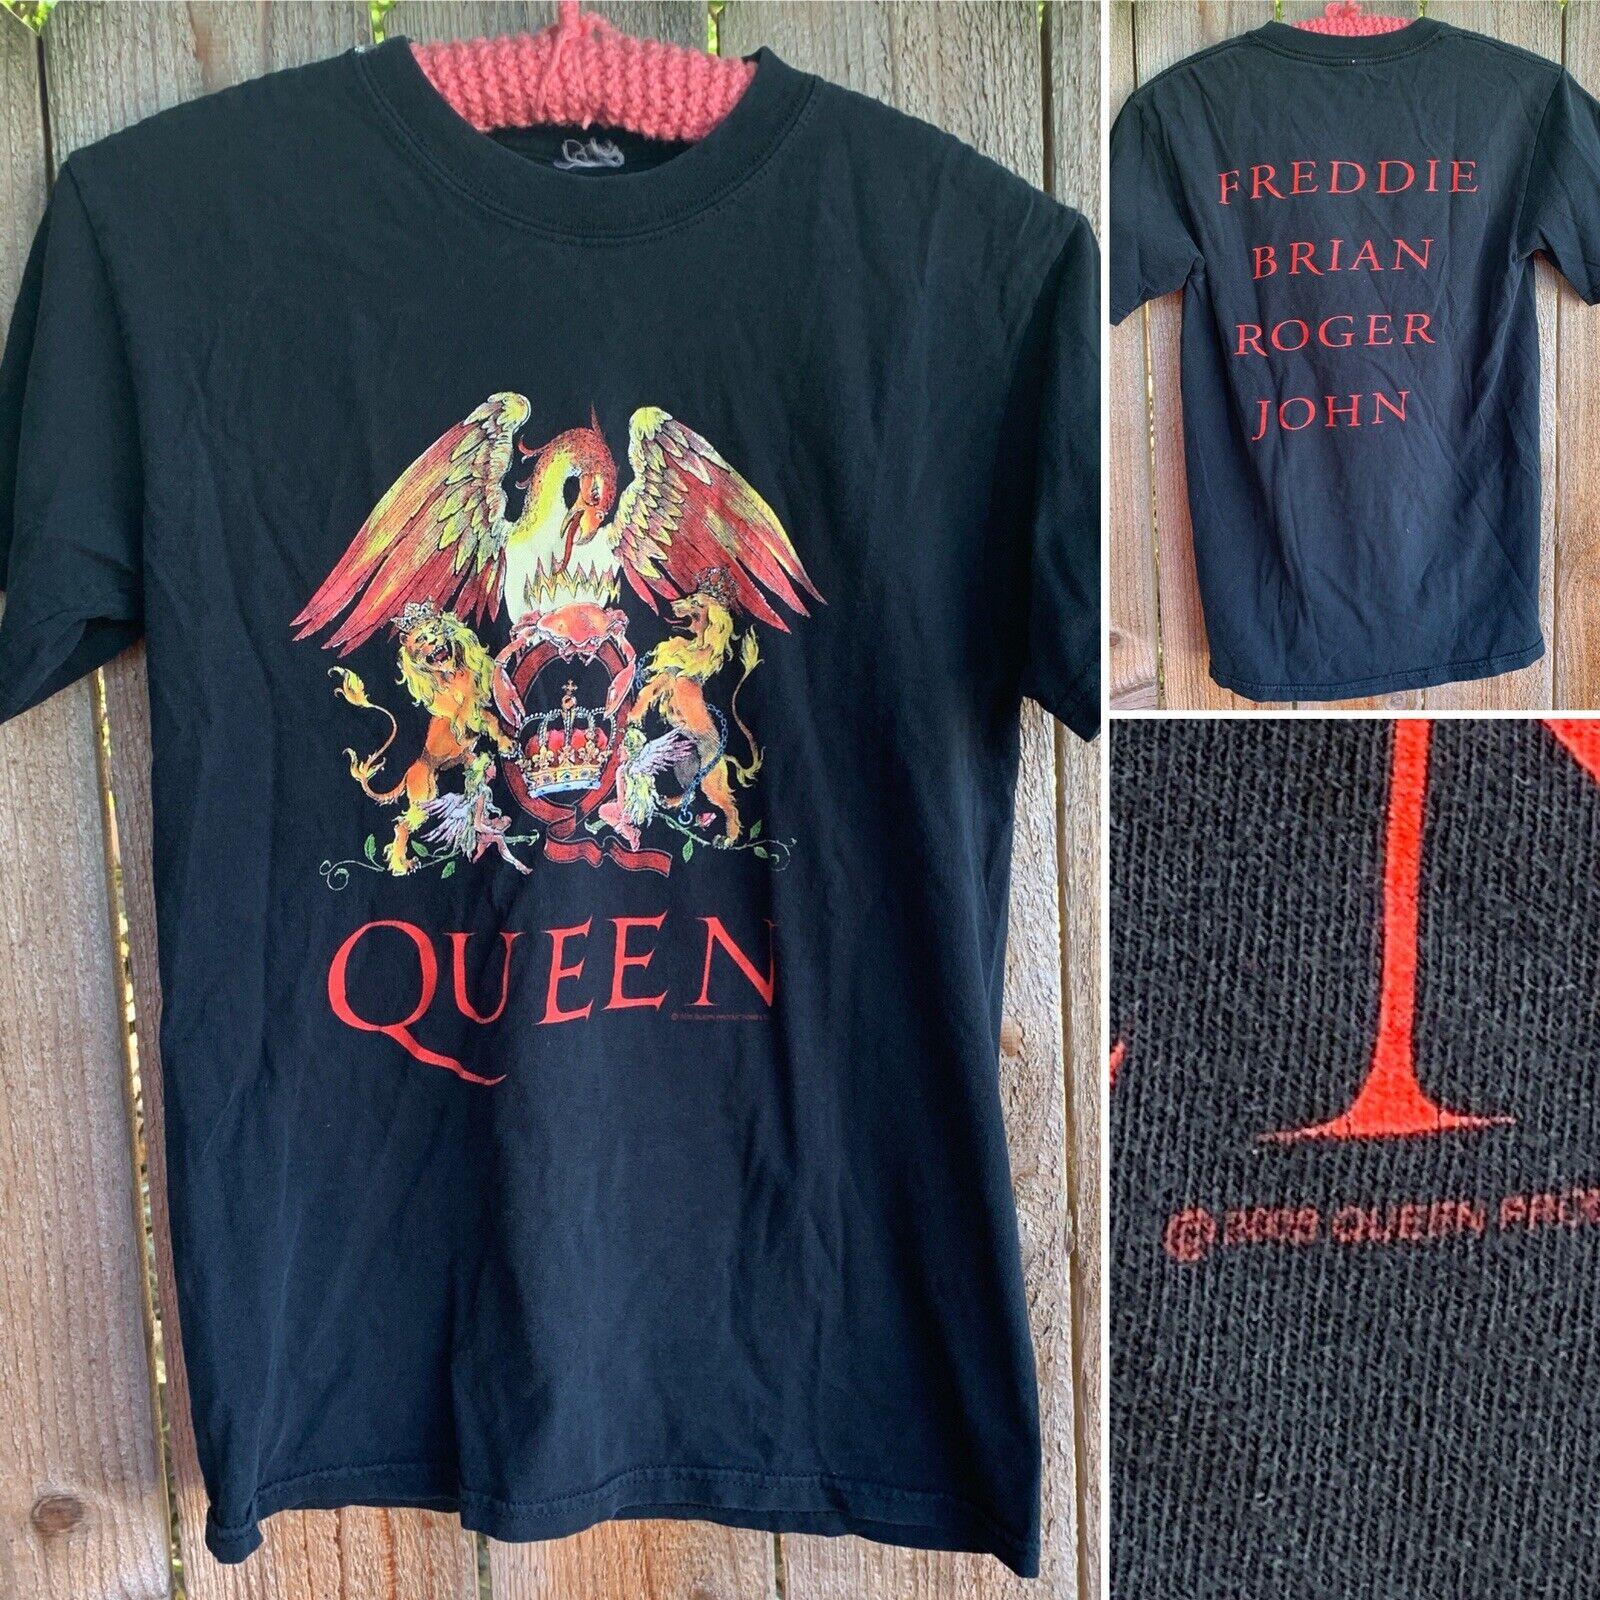 Queen Freddie Brian Roger John T-Shirt Graphics O… - image 3